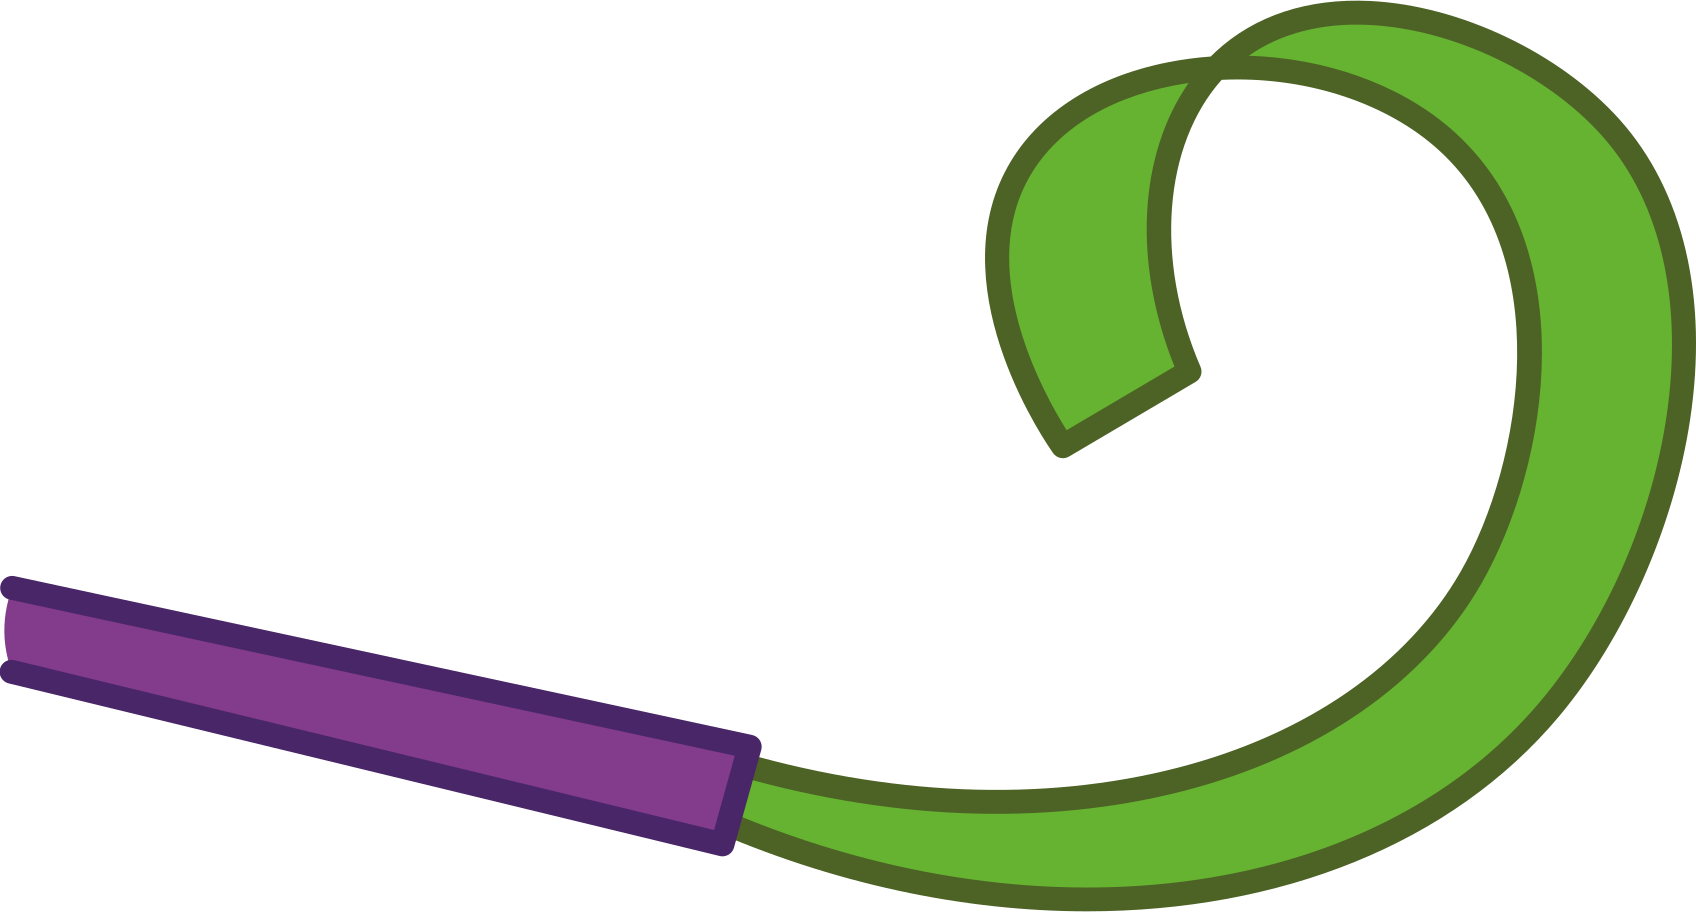 penny trumpet Clipart illustration in PNG, SVG